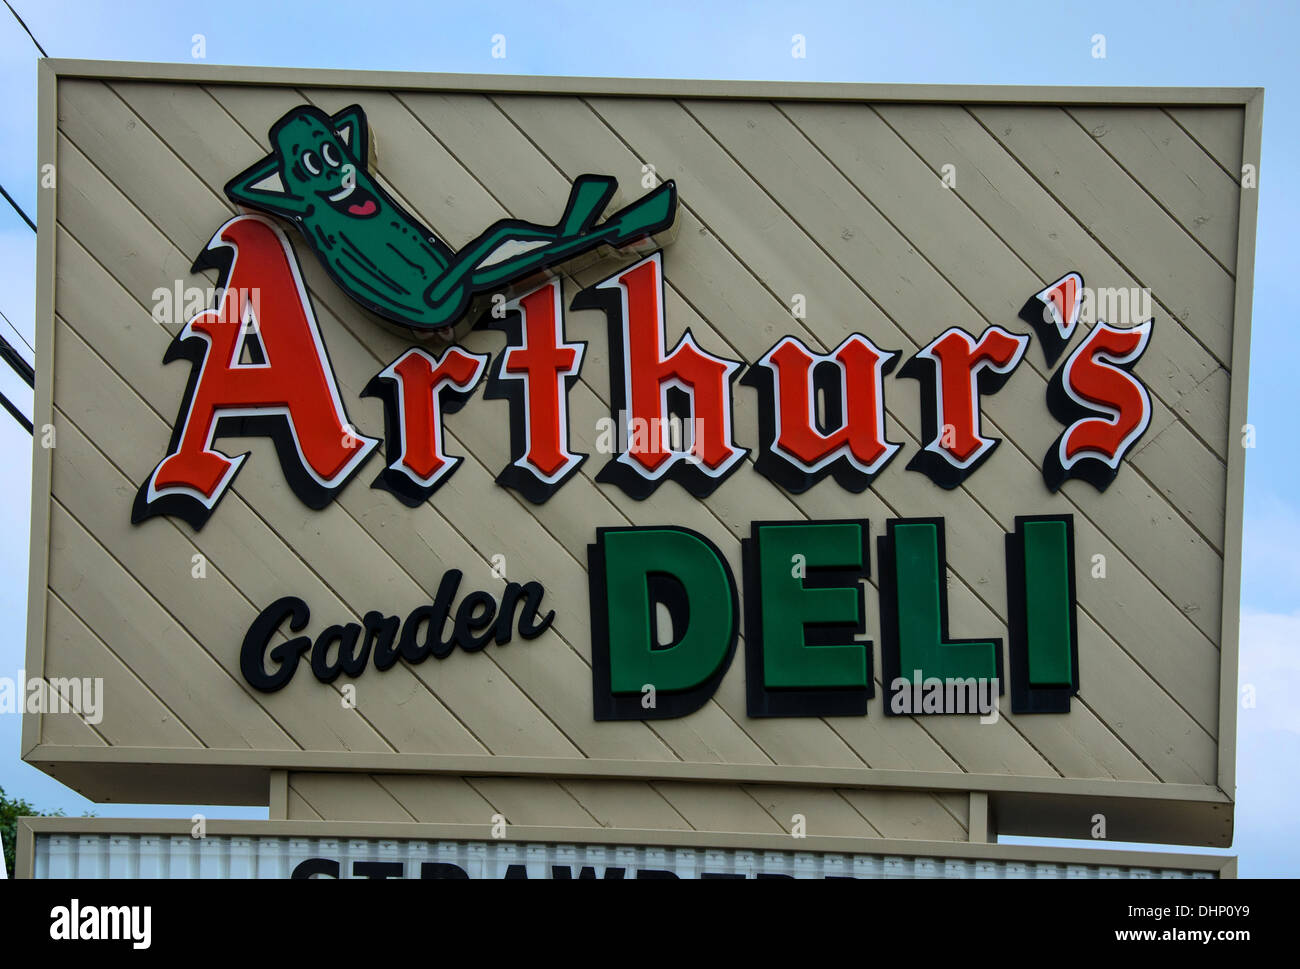 Arthur's Garden Deli is a popular sandwich shop in Dixon, Illinois, a town along the Lincoln Highway - Stock Image